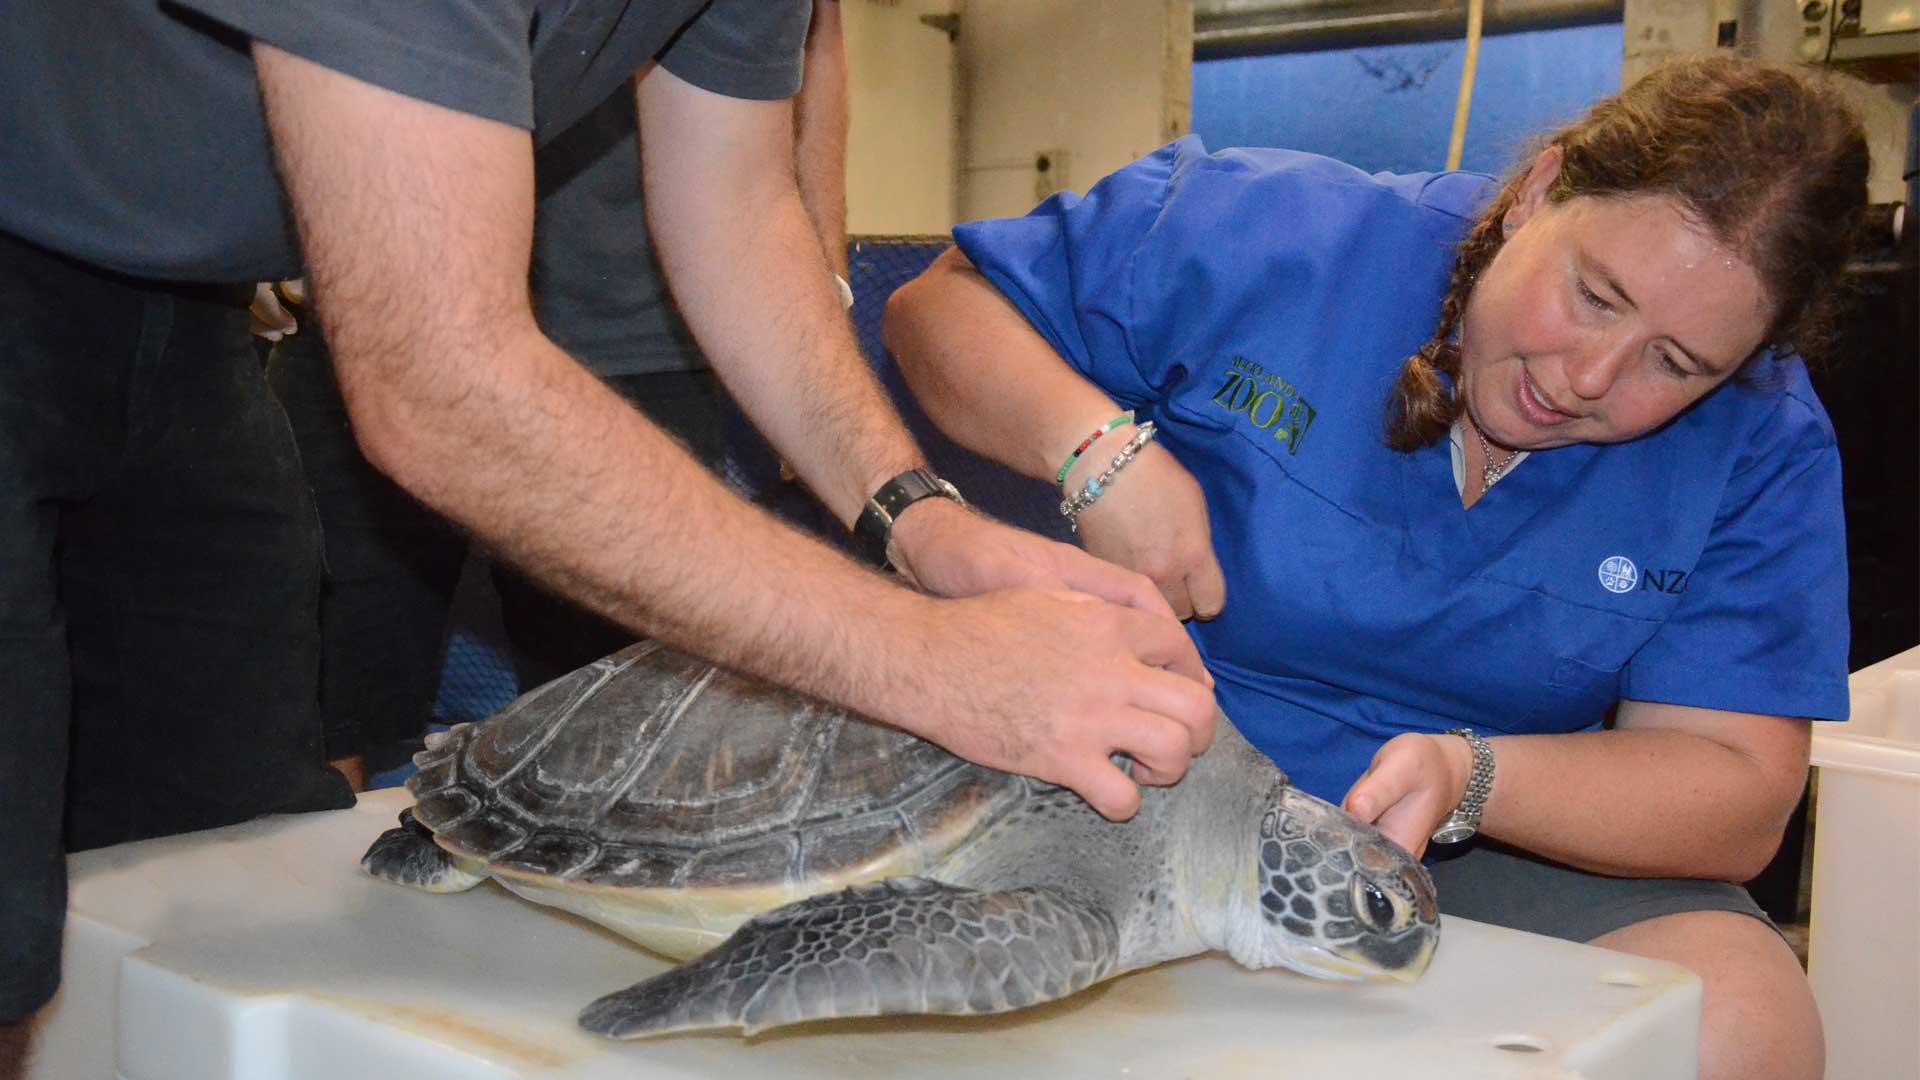 https://rfacdn.nz/zoo/assets/media/sea-turtle-treatment-gallery-1.jpg